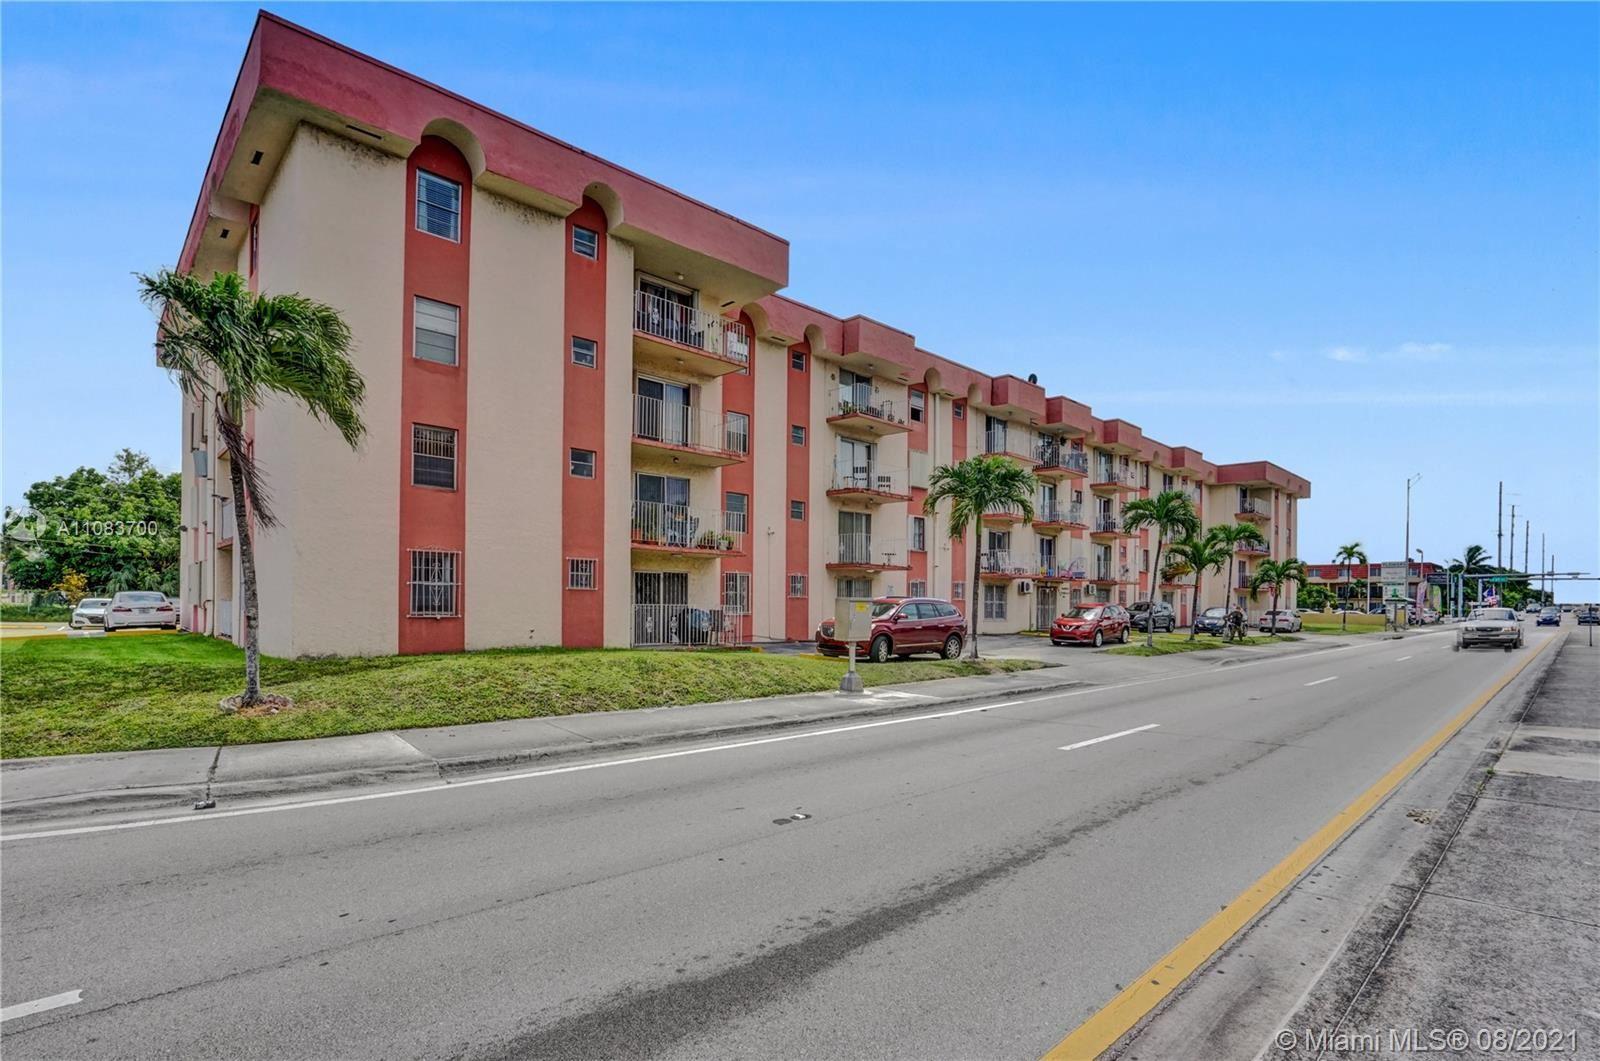 6820 W Flagler St #207, Miami, FL 33144 - #: A11083700